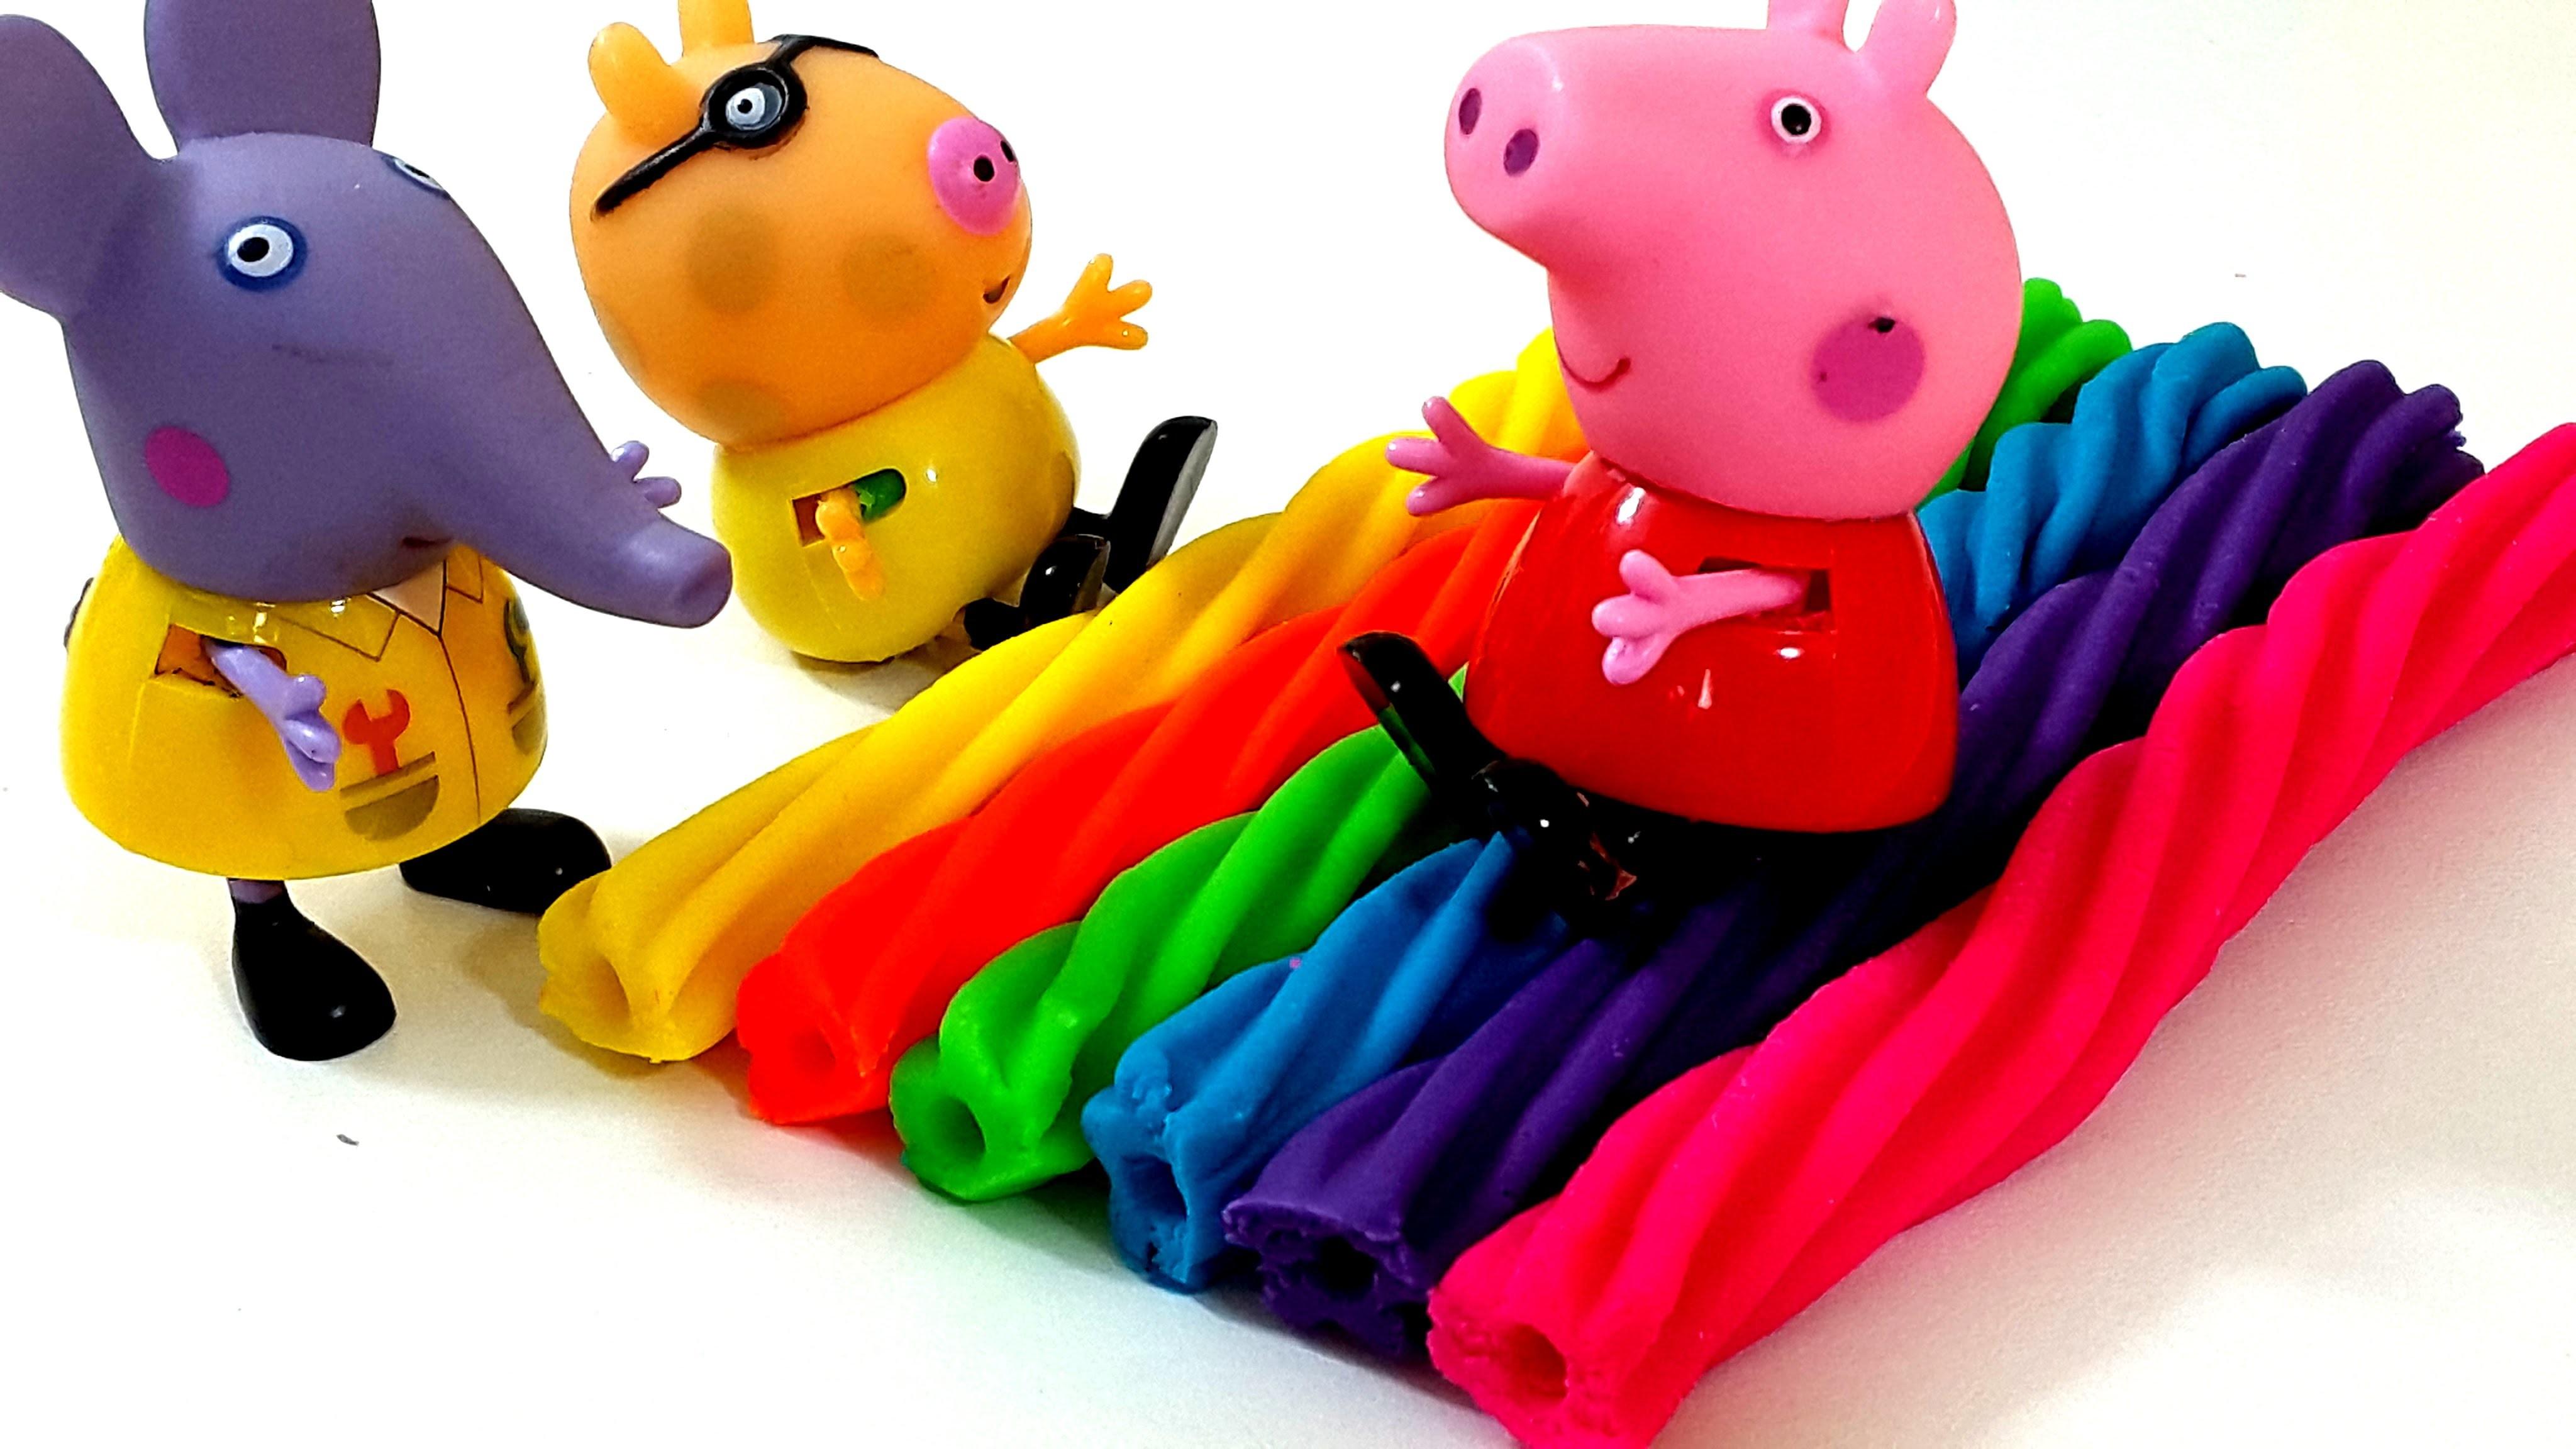 Peppa Pig Family Watching Play Doh How To Make Rainbow Licorice